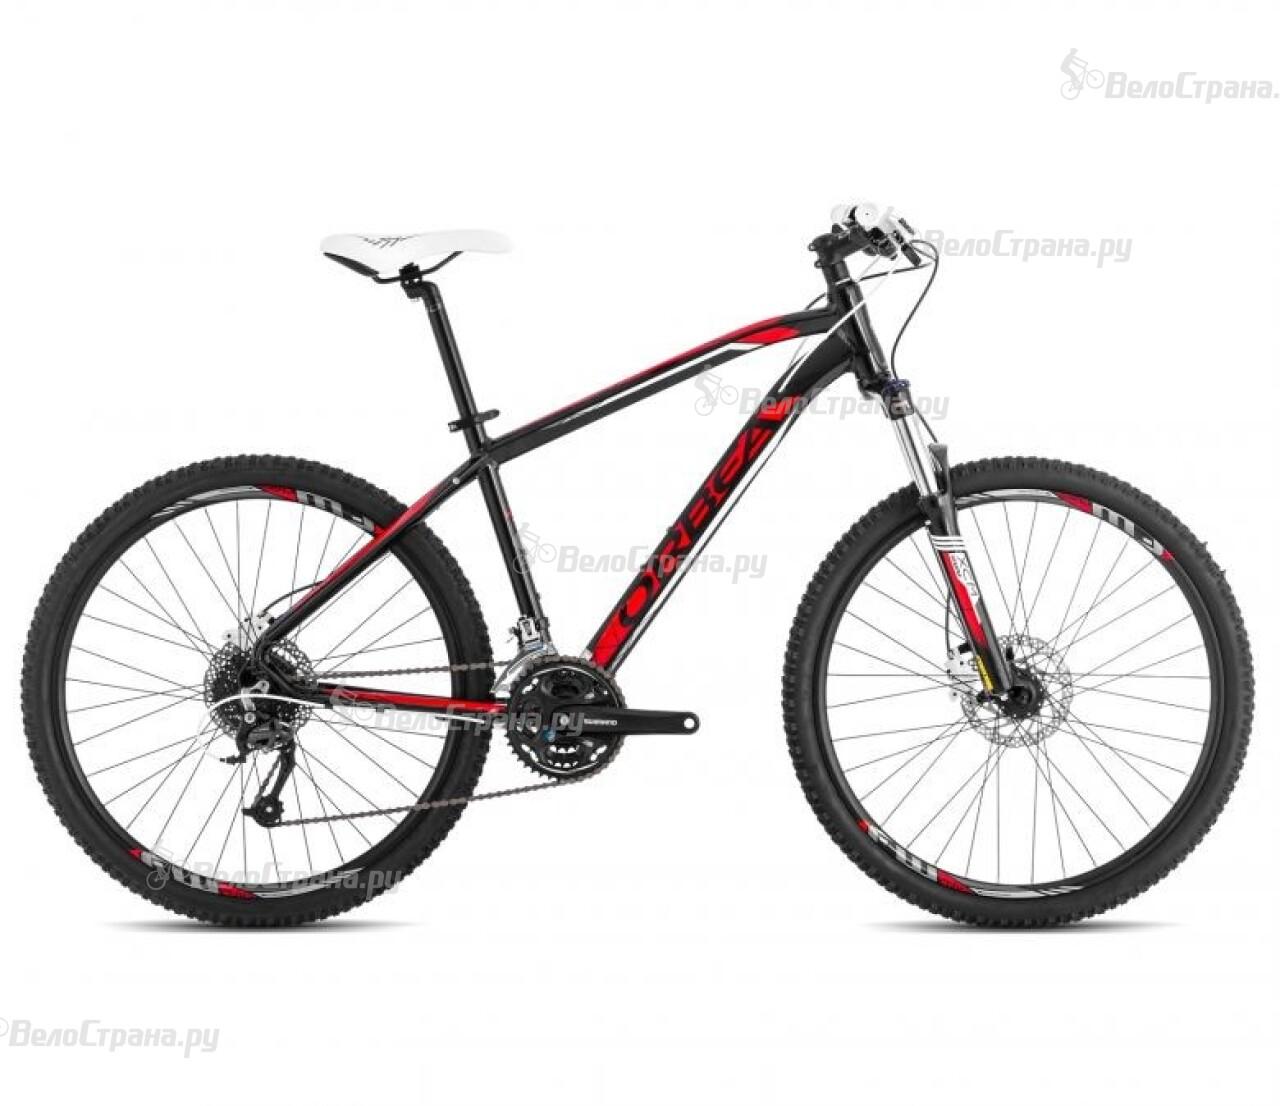 все цены на Велосипед Orbea Mx 26 30 (2014) онлайн